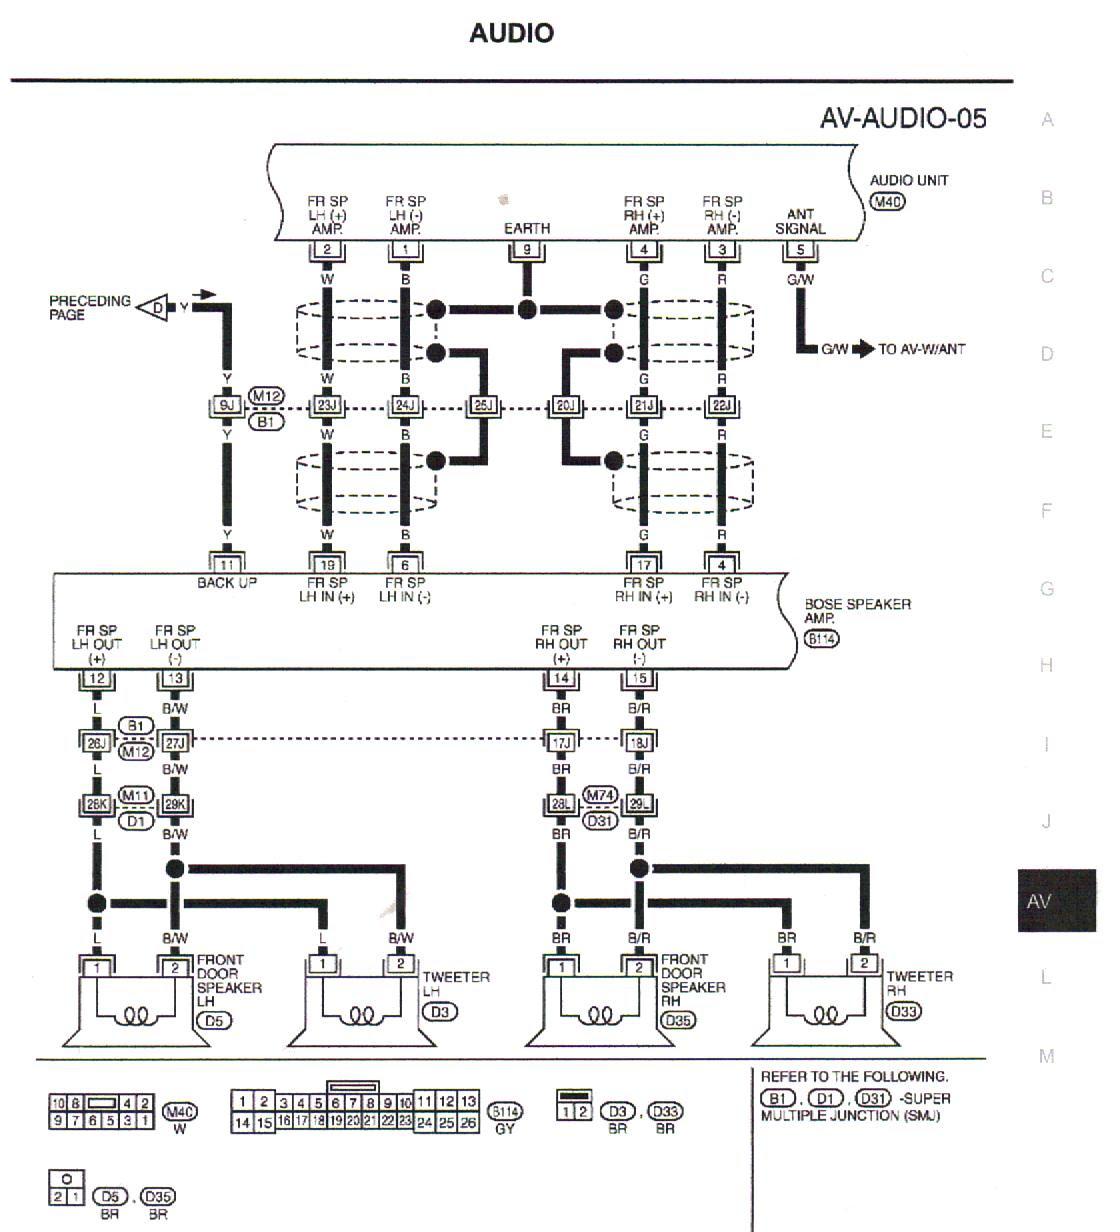 Diagram 2008 Infiniti G37 Wiring Diagram Full Version Hd Quality Wiring Diagram Speculativegrammarian Euganeacup It